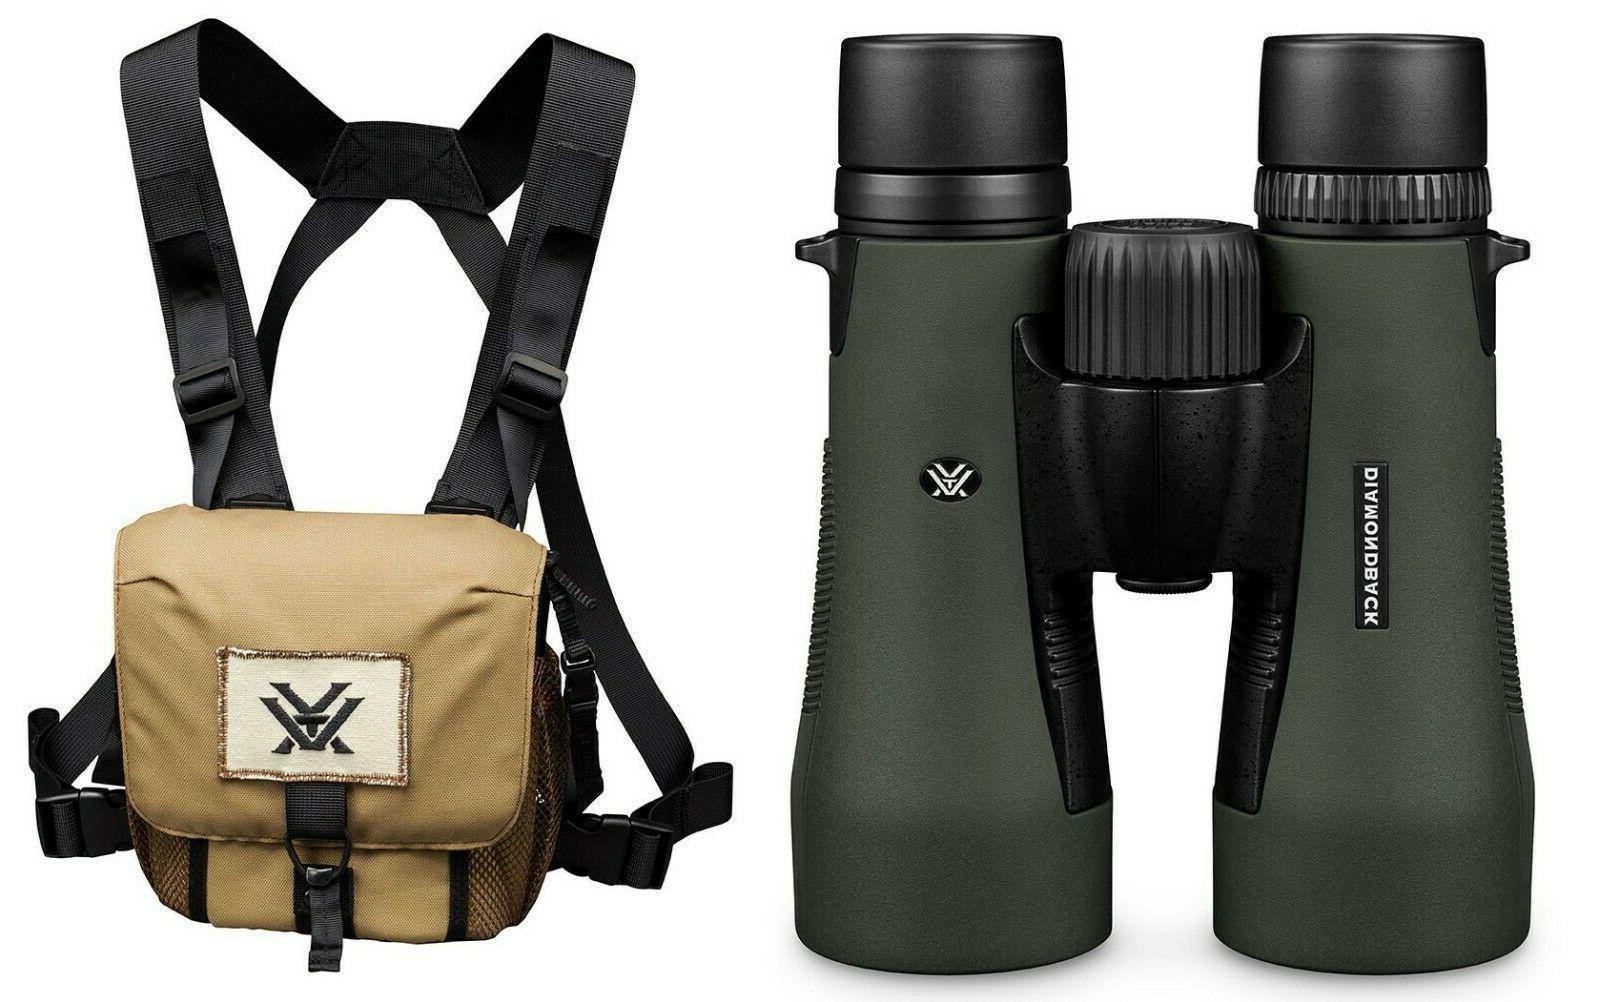 Vortex 2019 Diamondback Binocular w/ Vortex